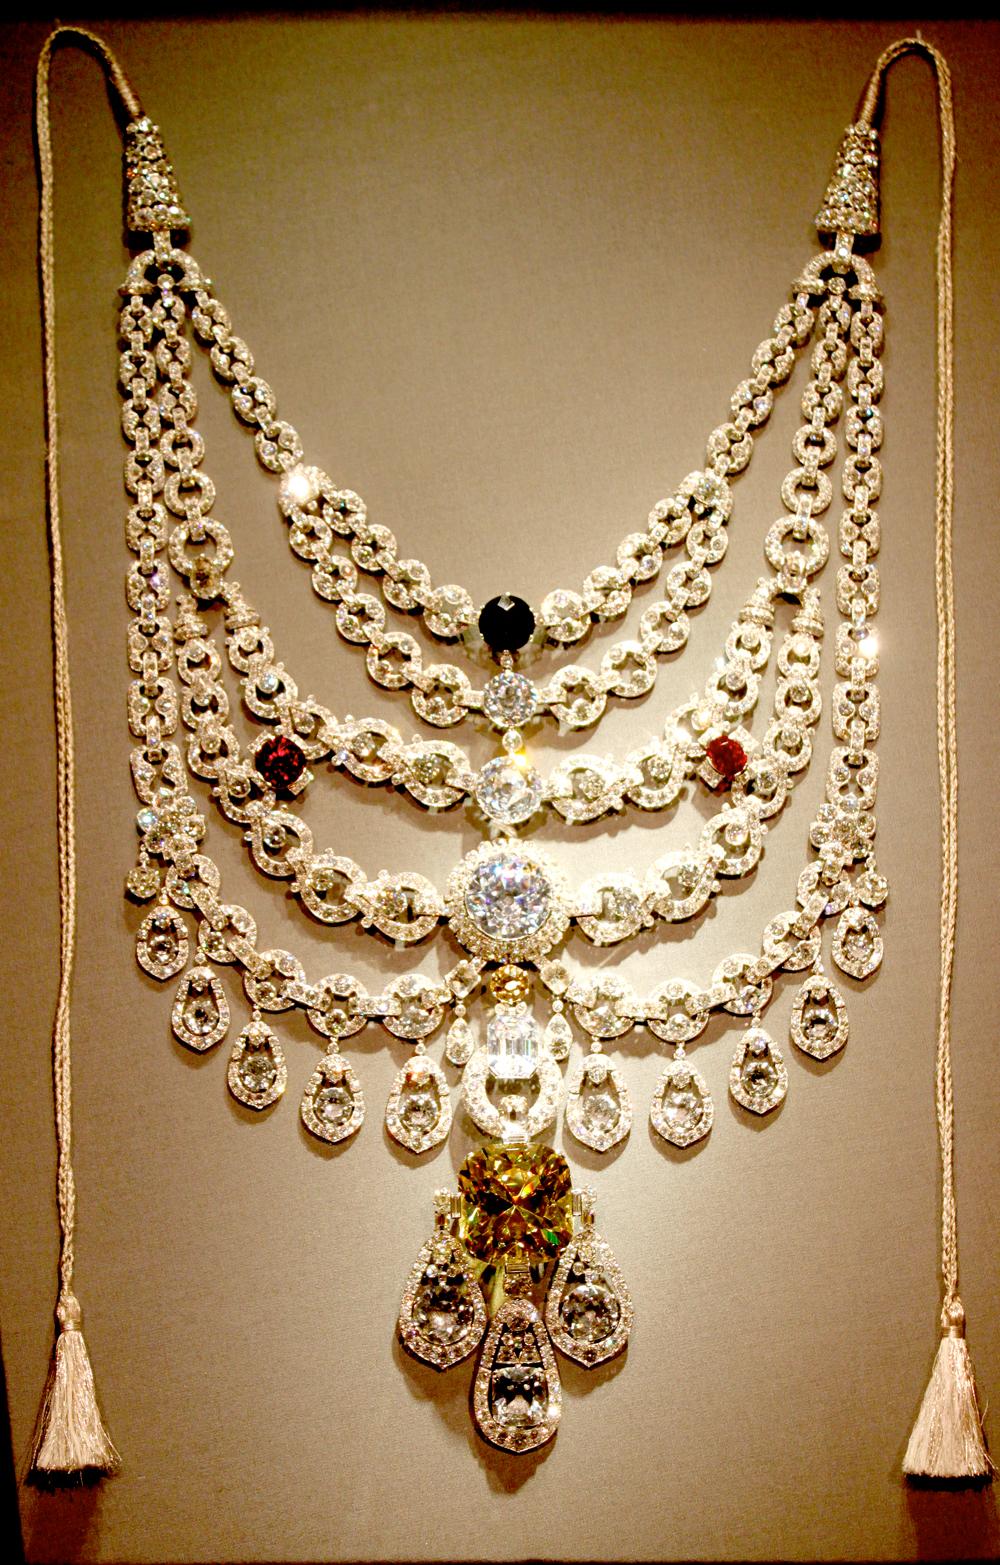 Fashion Metropolitan: India´s Royal Jewels. The current ...